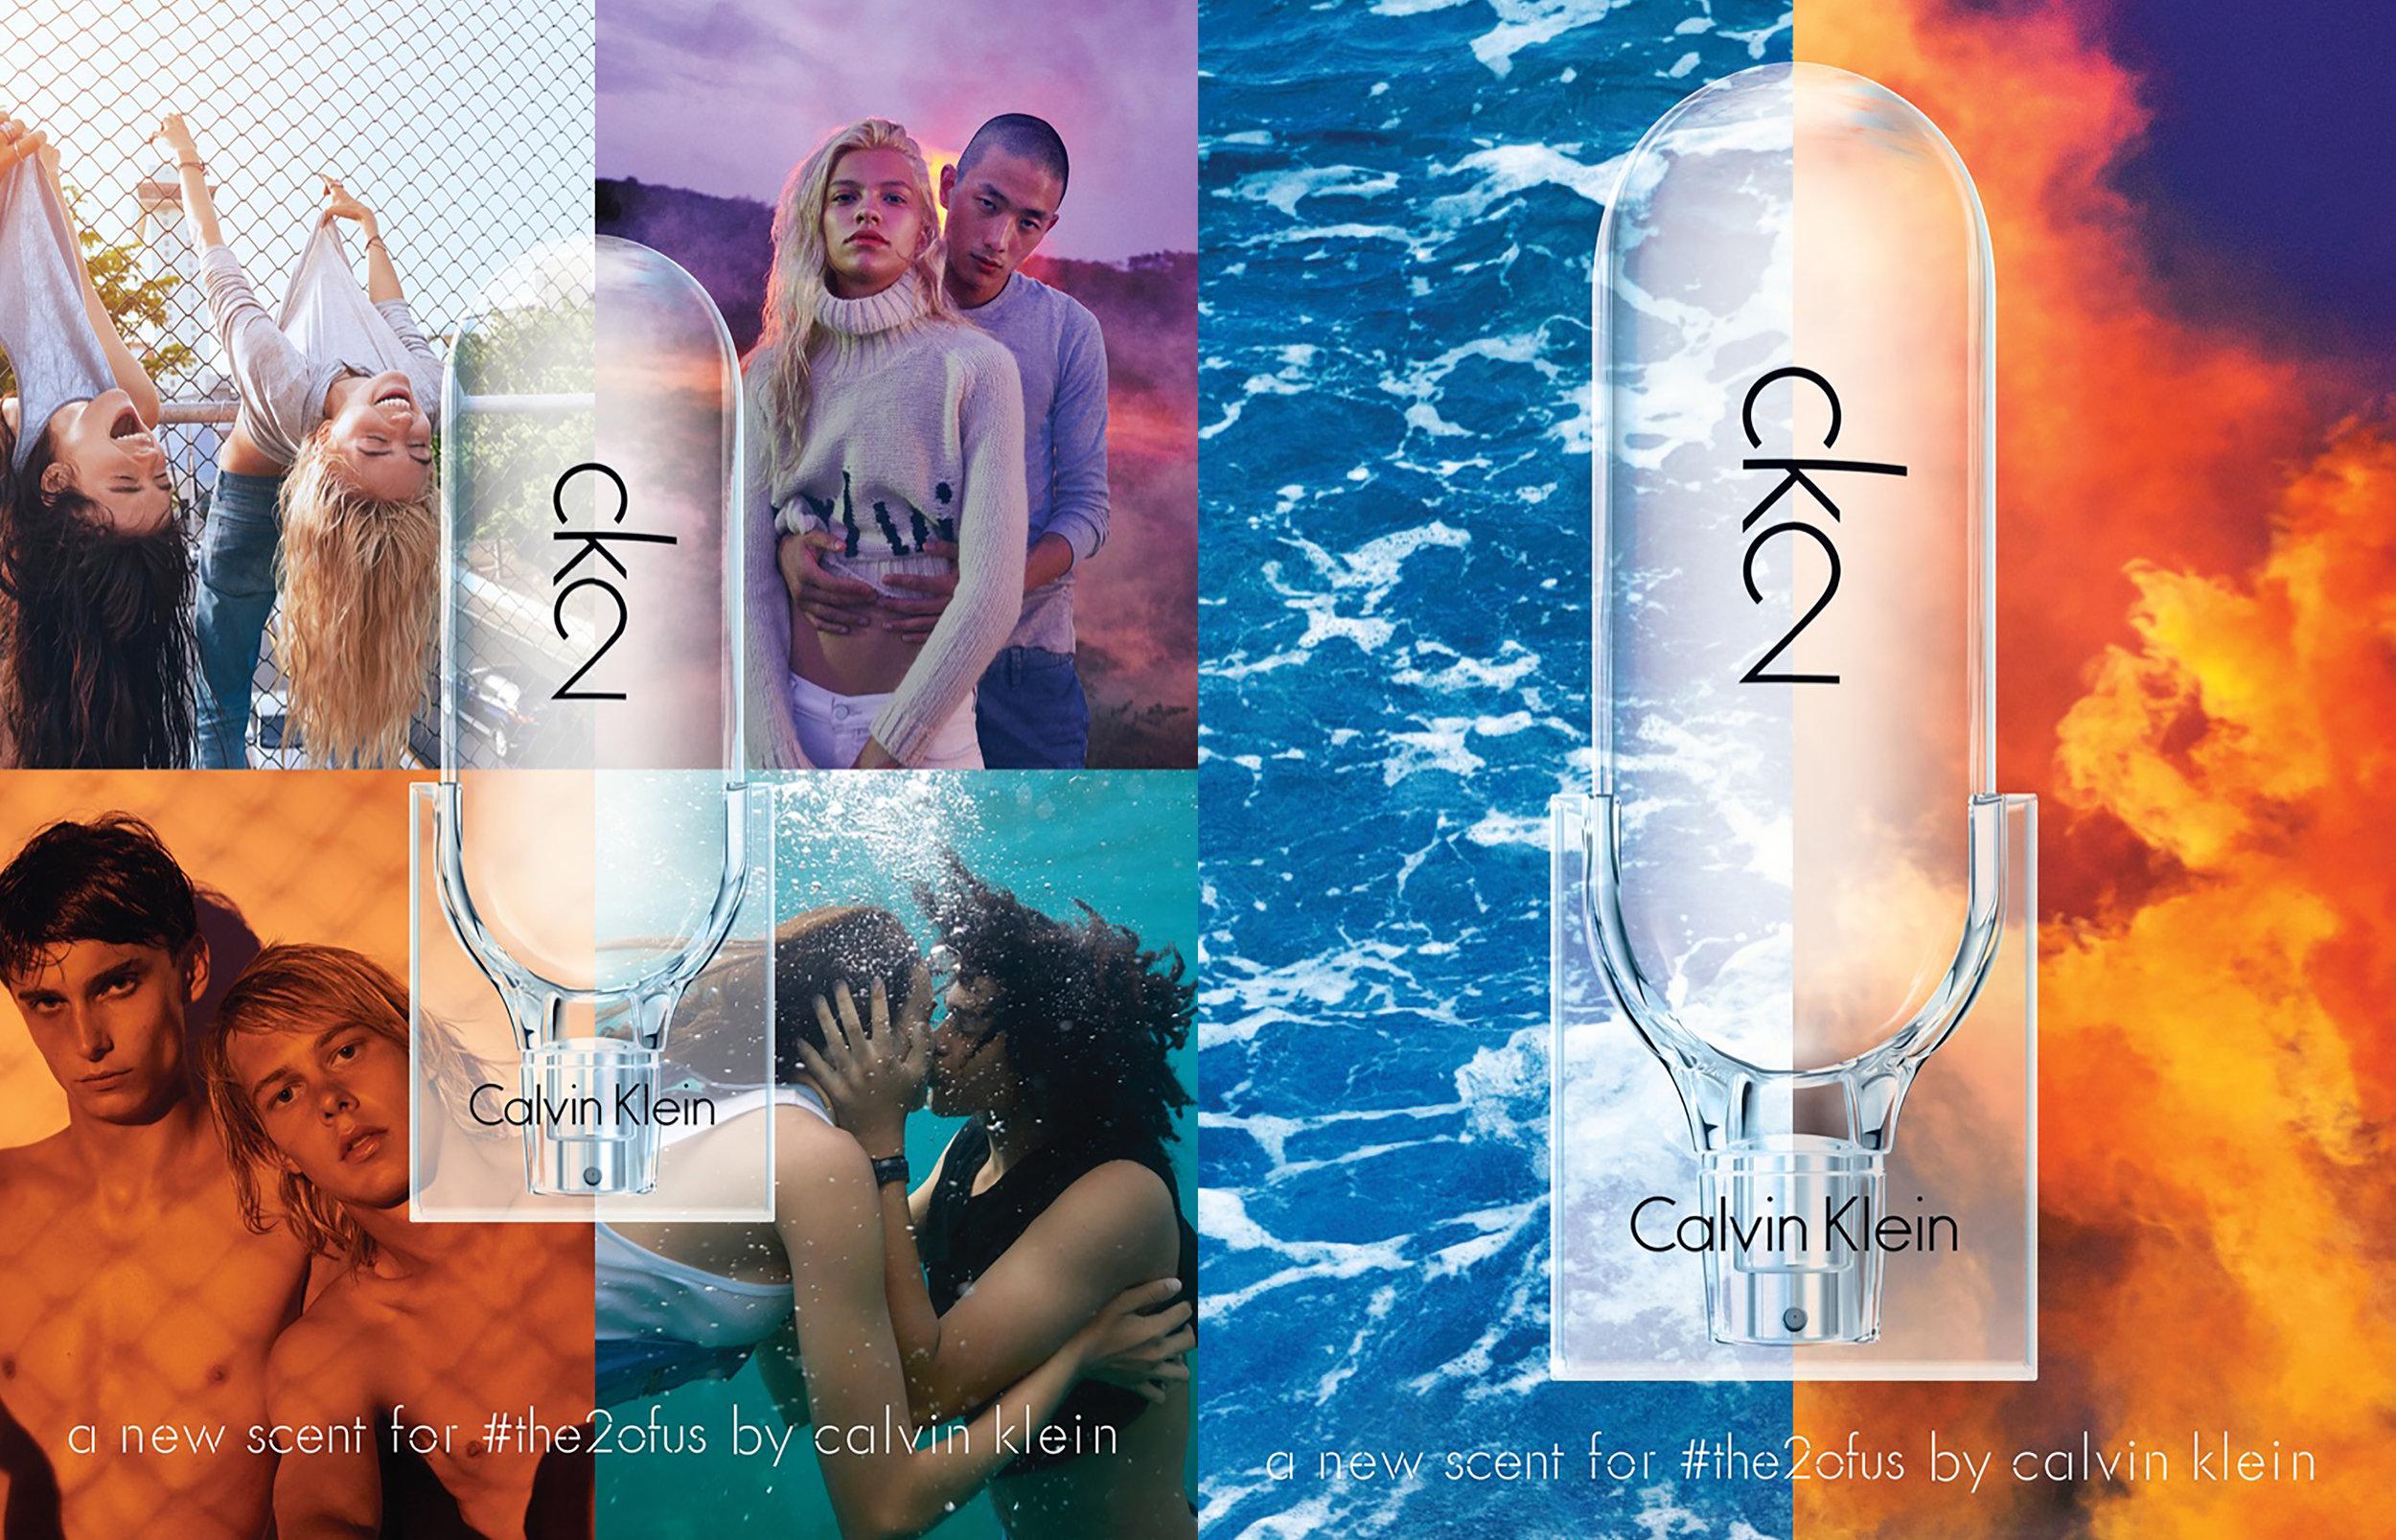 Calvin-Klein-CK2-Fragrance-Ad-Campaign02.jpg